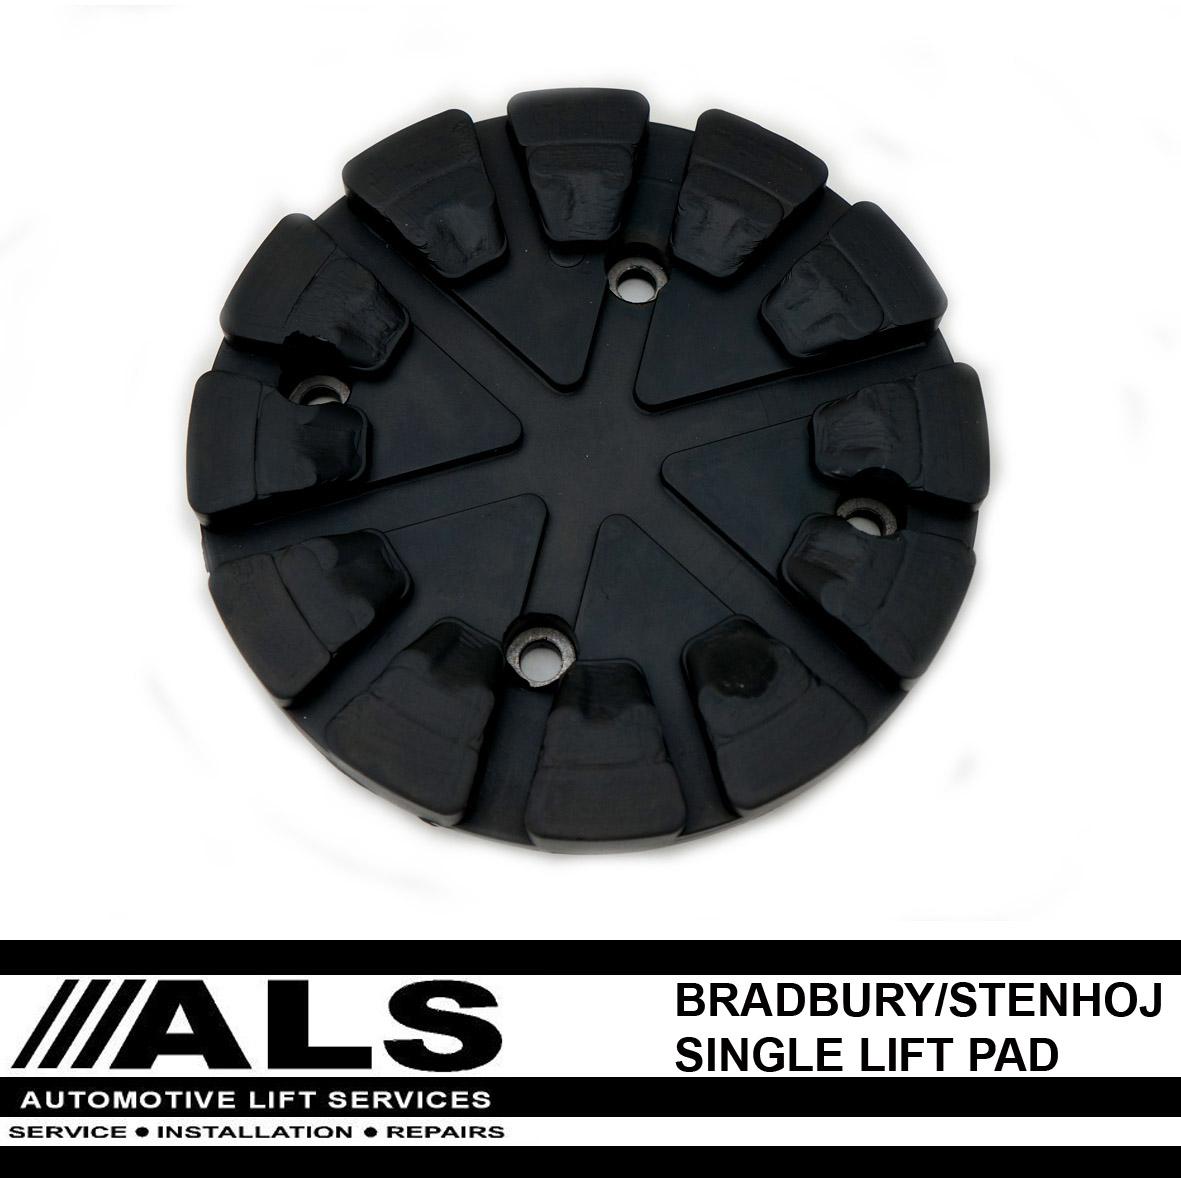 Bradbury/Stenhoj Lift Pads (1)